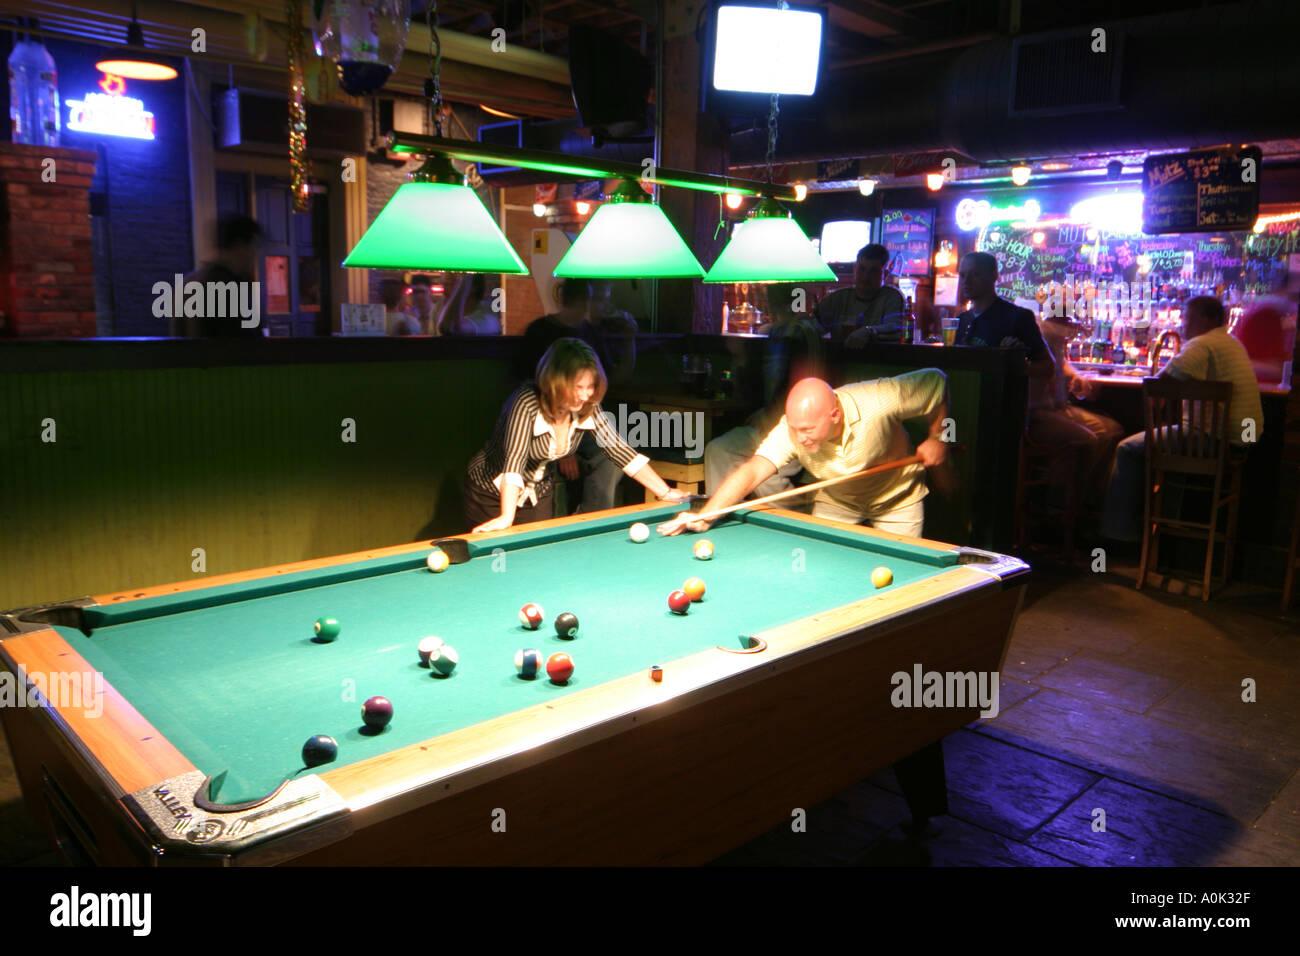 pool table bar.  Bar Toledo Ohio Oliver House Bar Nightlife Billiards Pool Table Recreation  Couple Man Aiming Woman And Pool Table Bar B